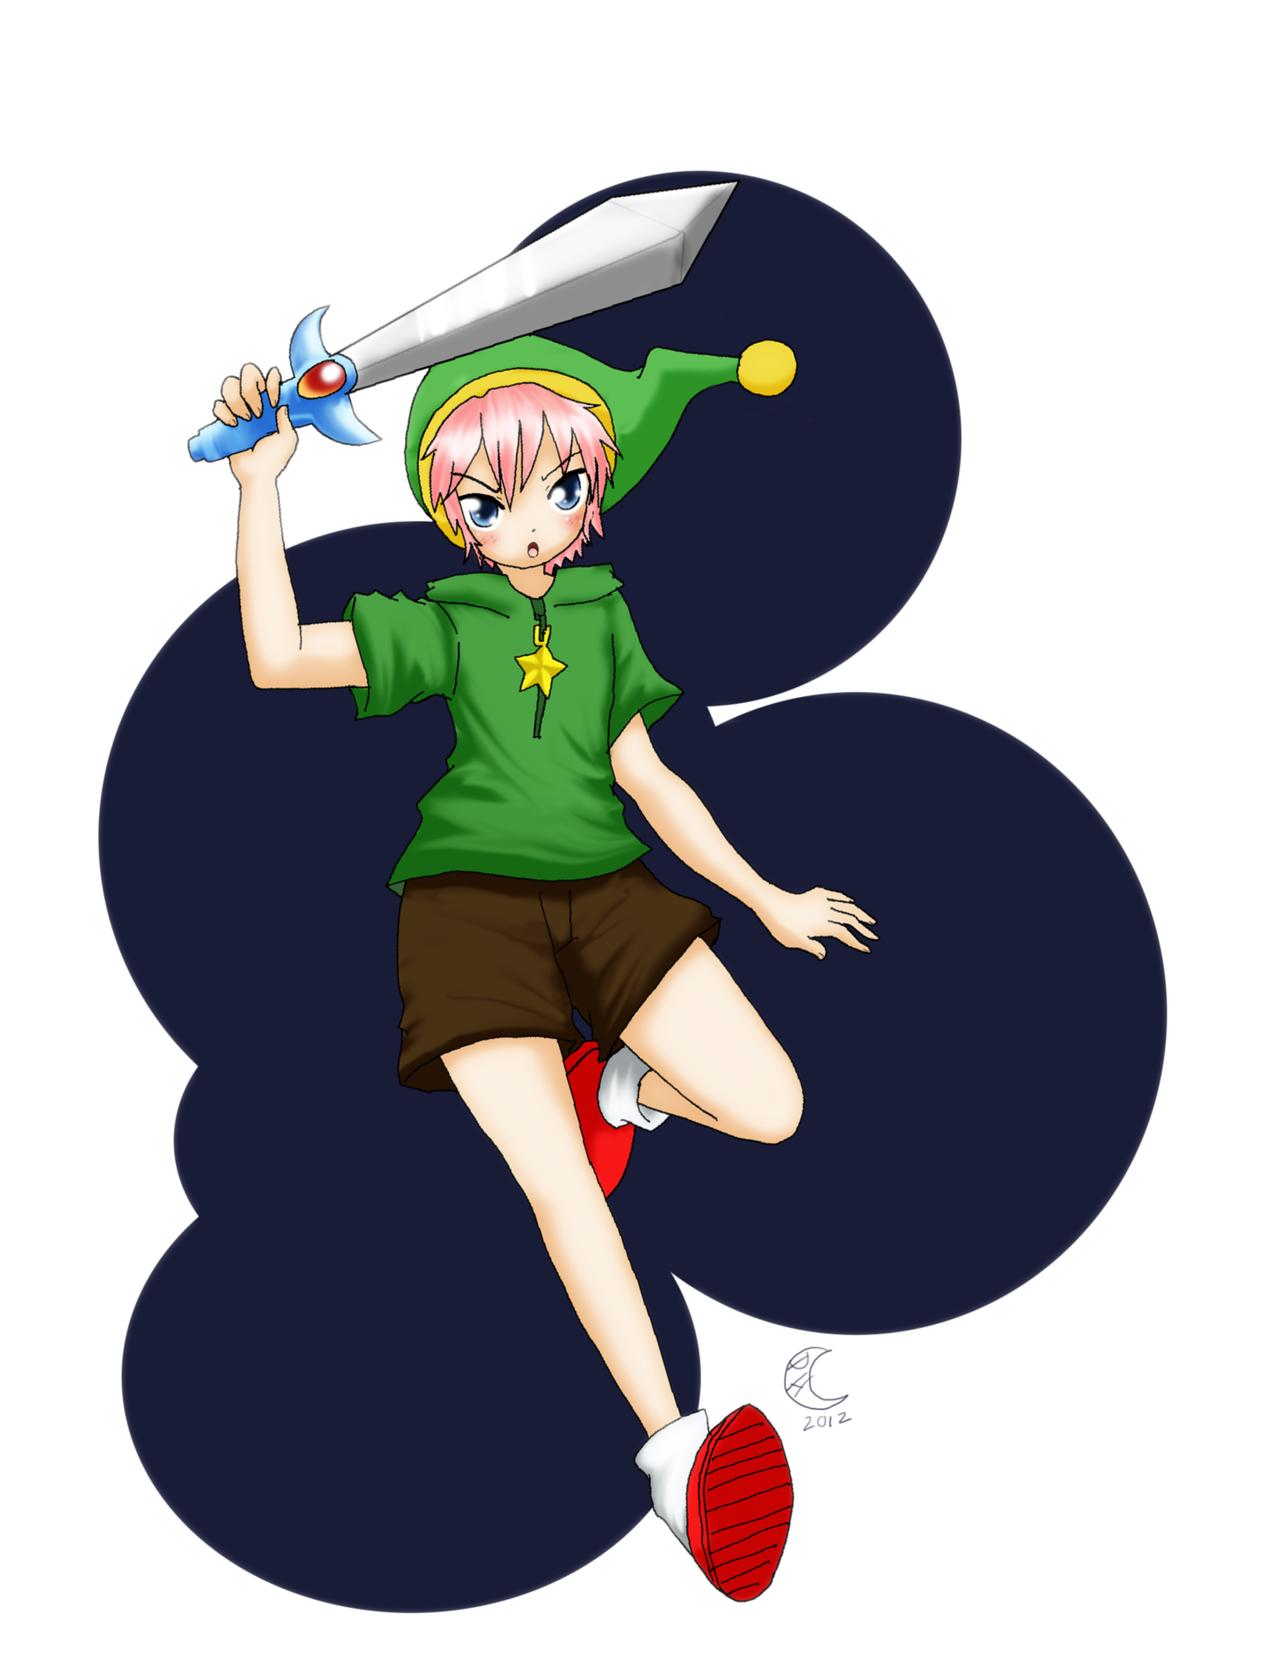 Sword Kirby by Anigirl5 on DeviantArt